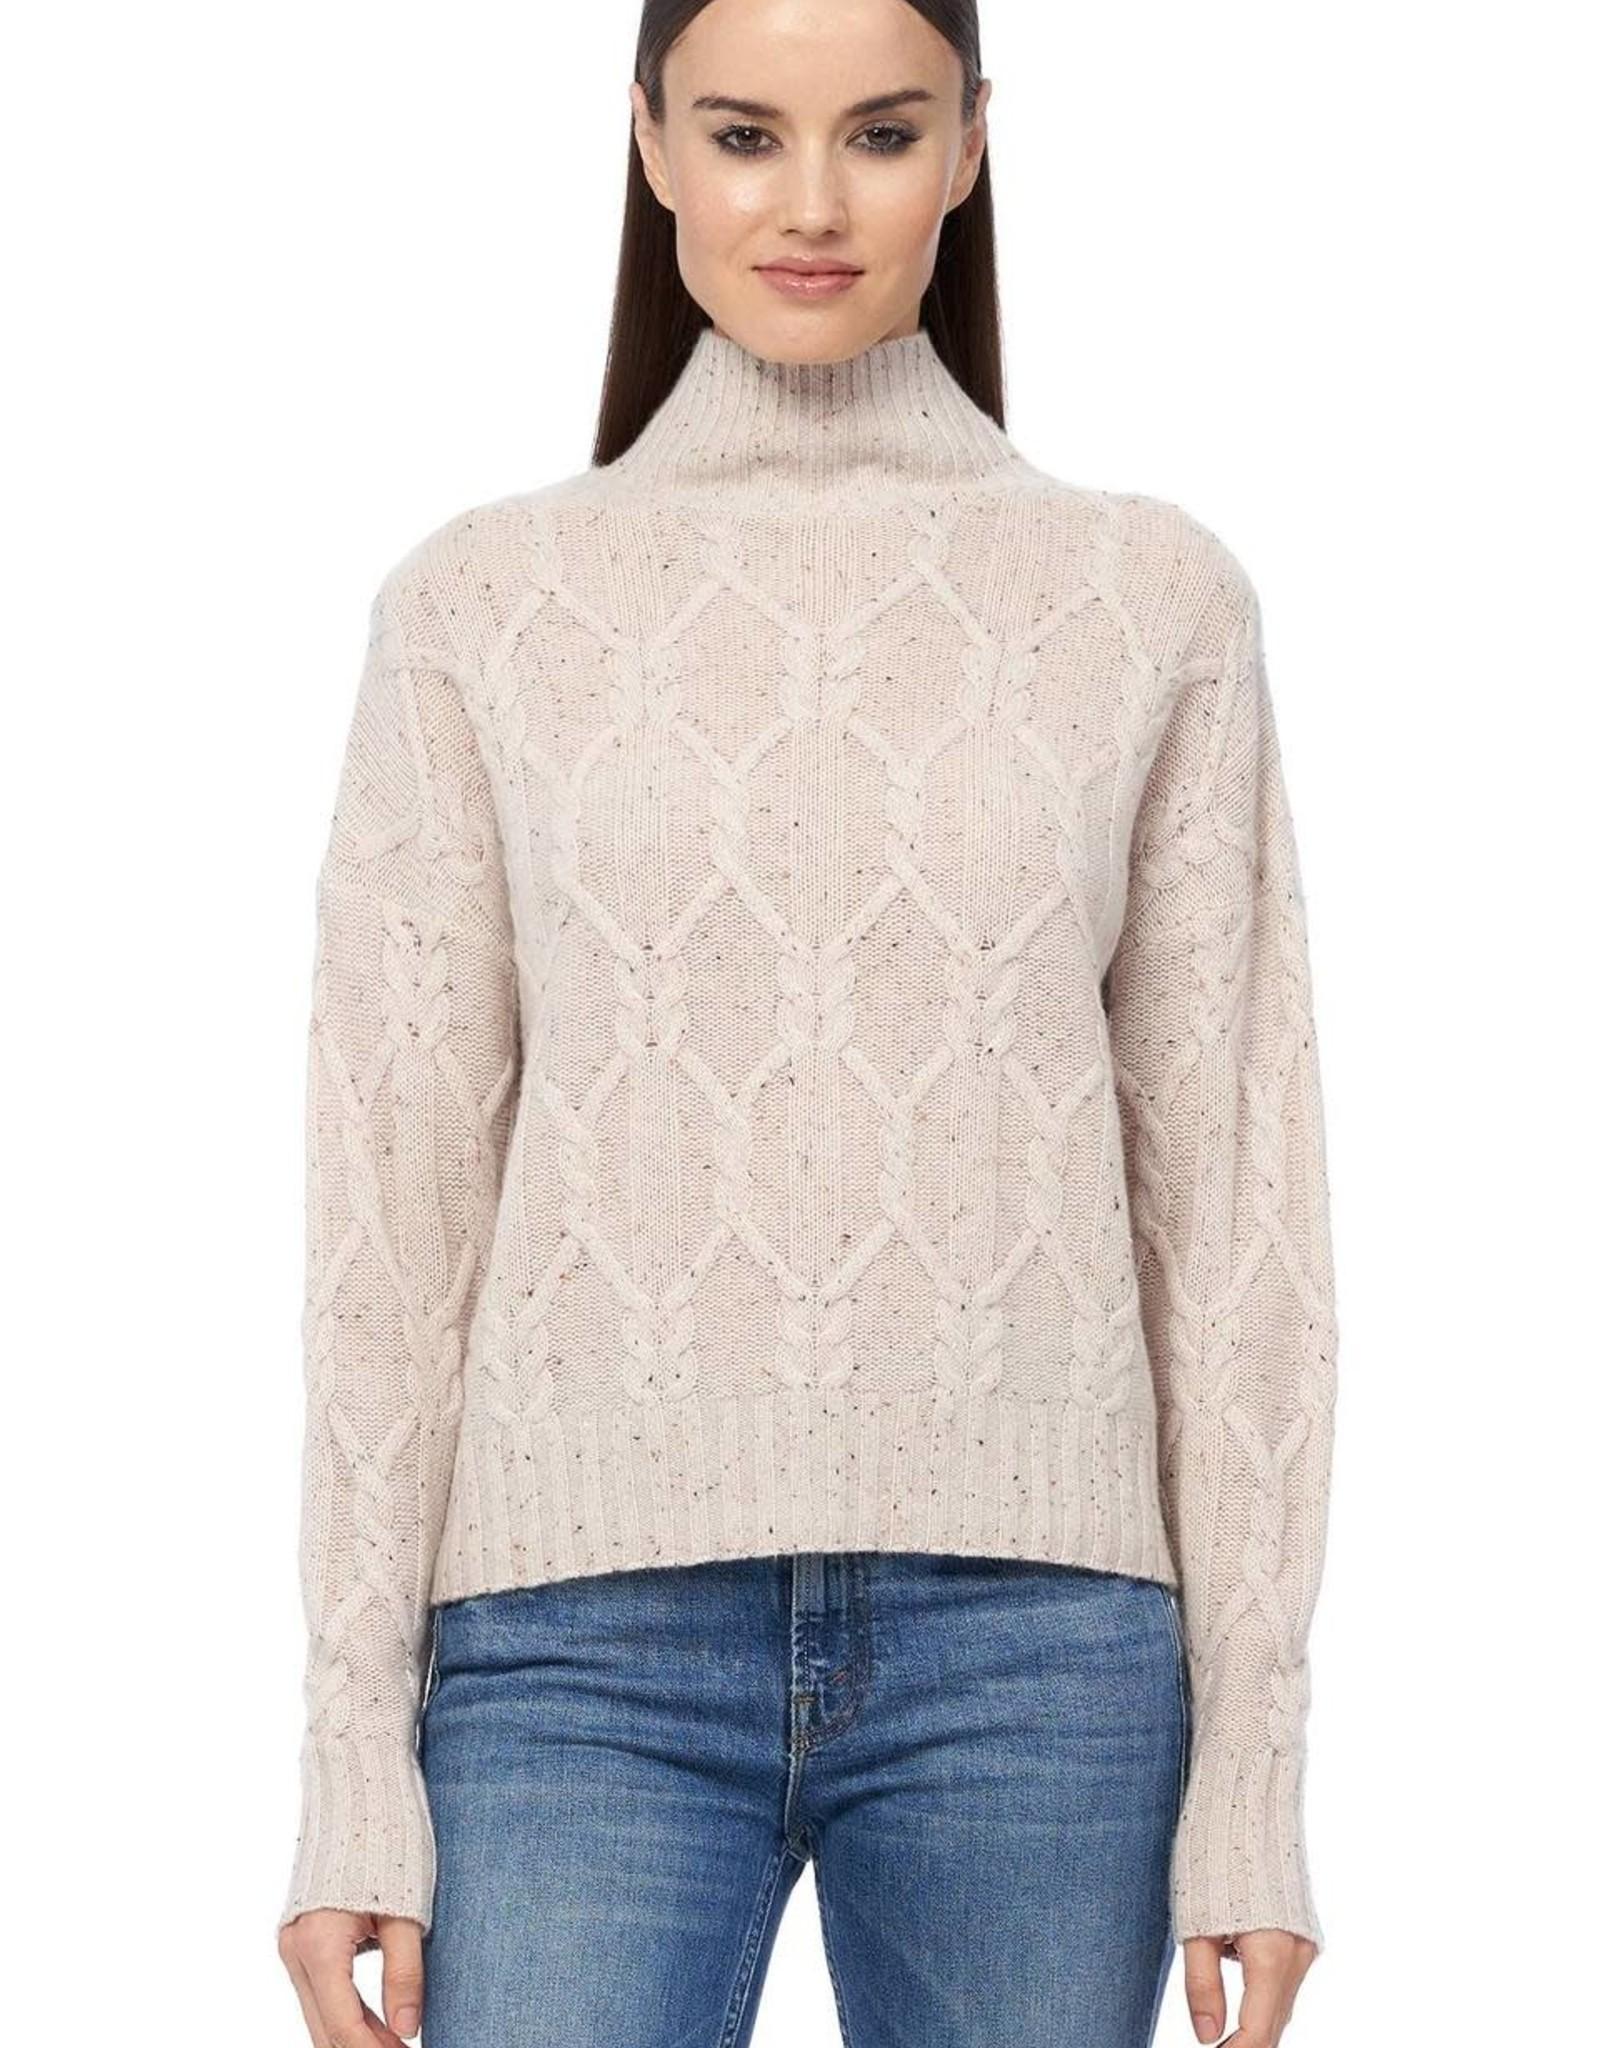 360 Cashmere 360 Cashmere Miriam Sweater